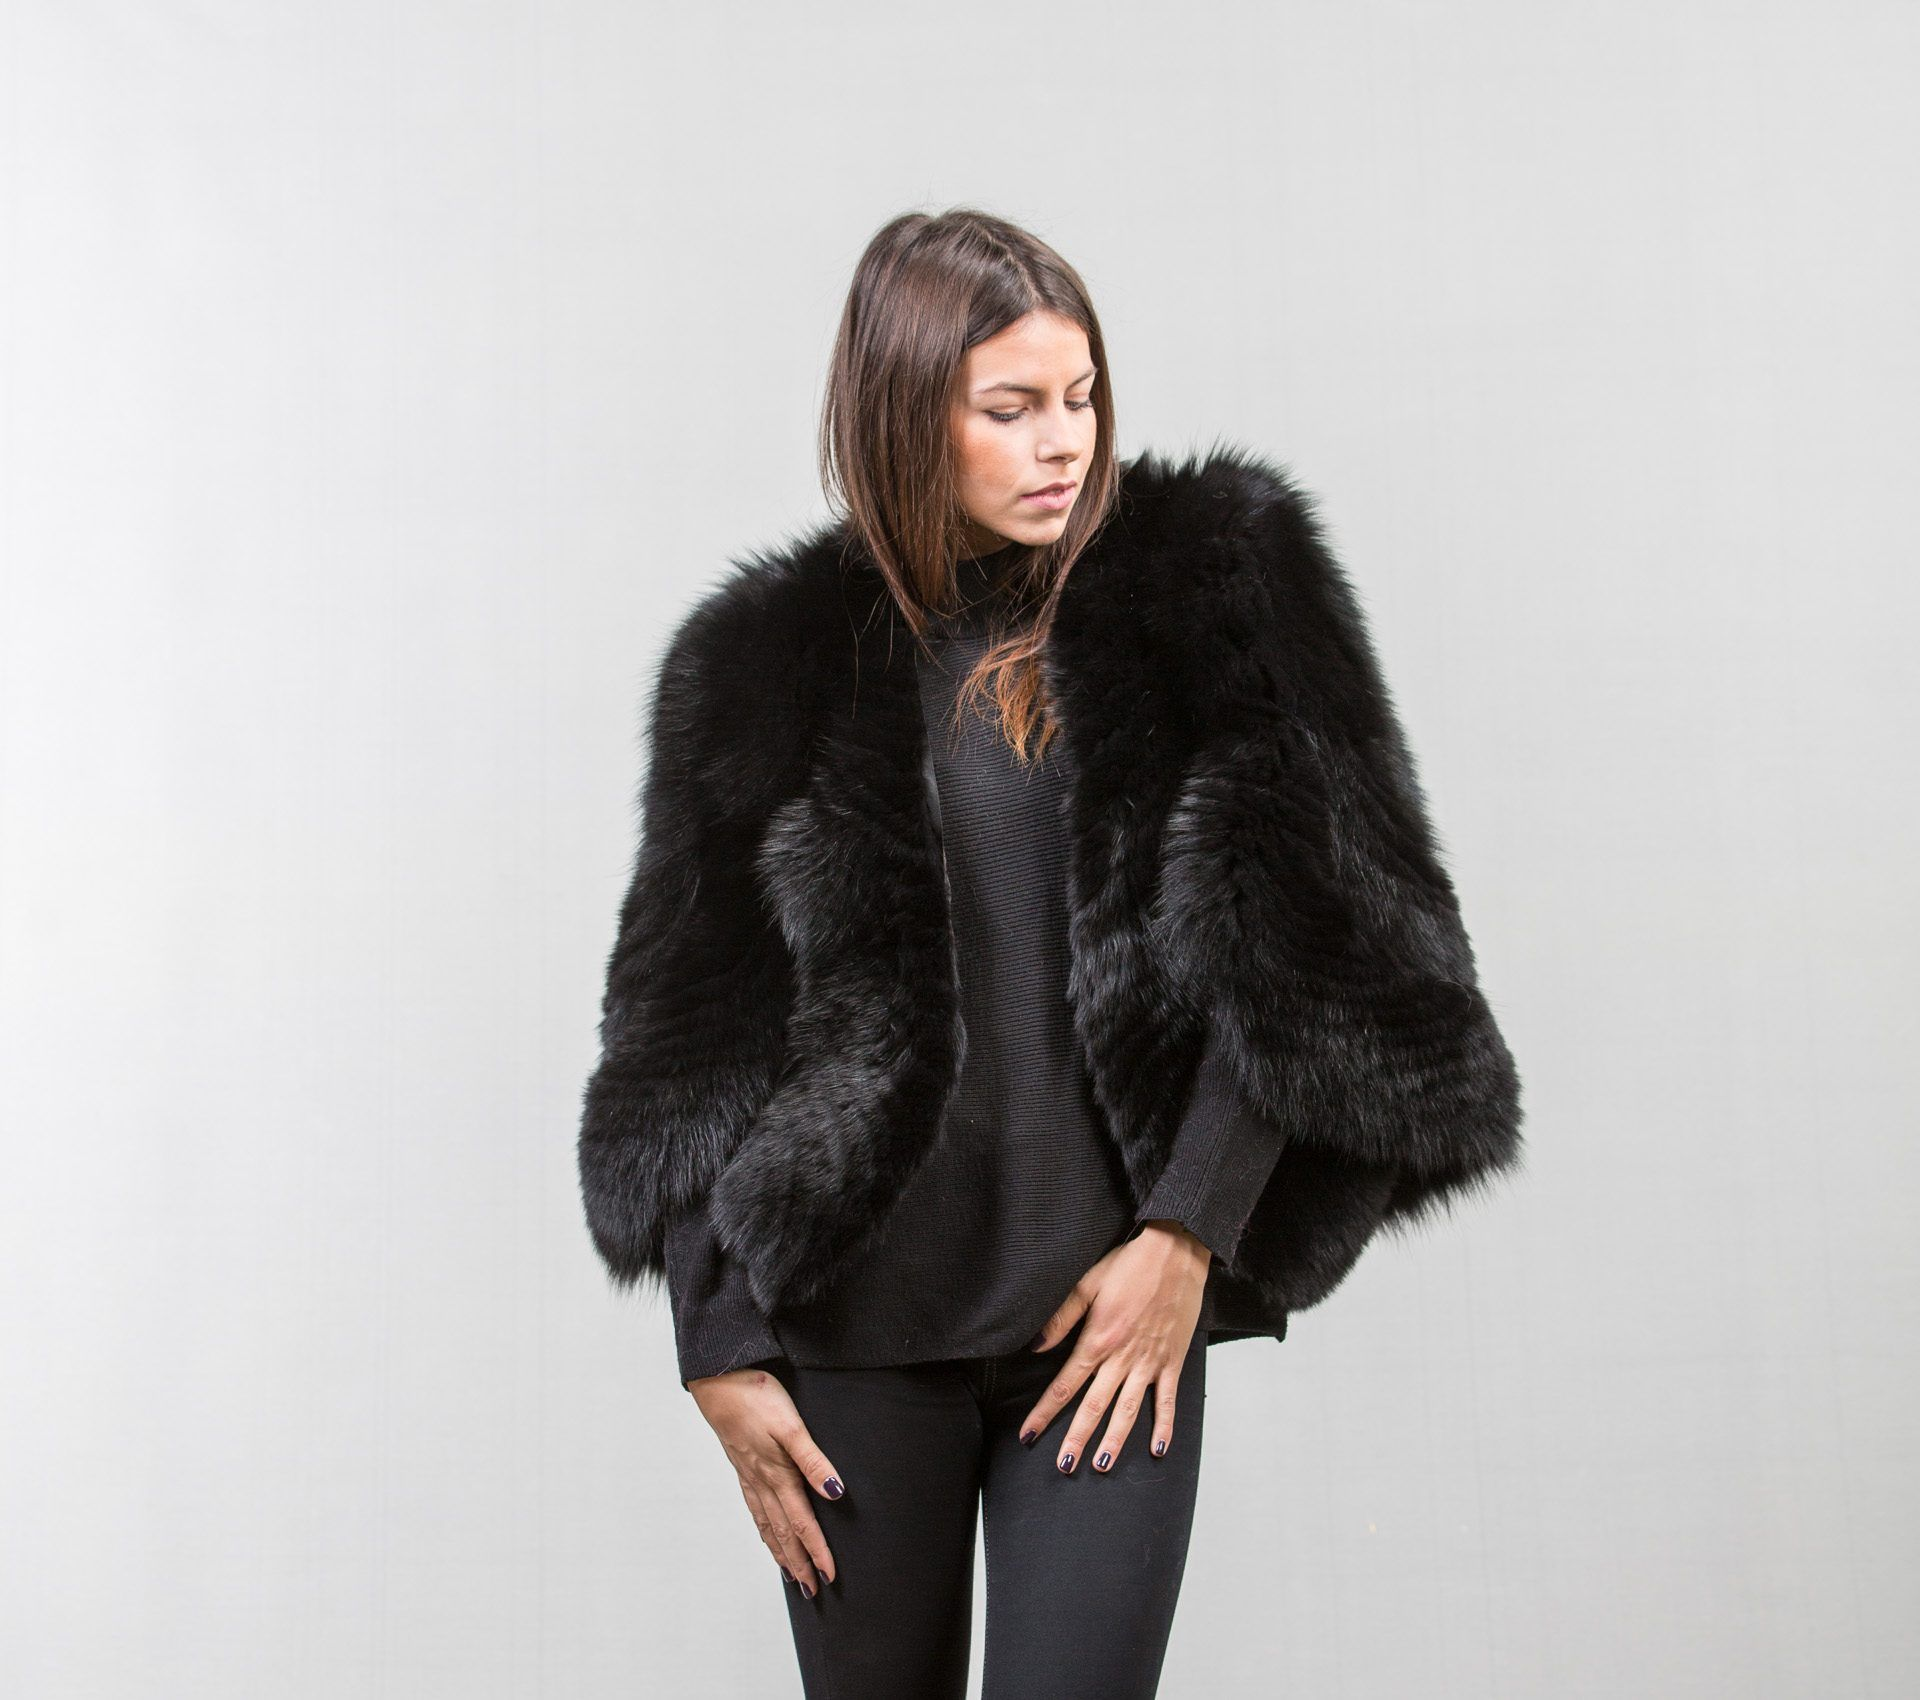 05fdbd81dd244 Black fox fur cape  saga  black  fox  fur  cape  coat  jacket  real  classy   style  fashion  wear  elegant  chic  haute